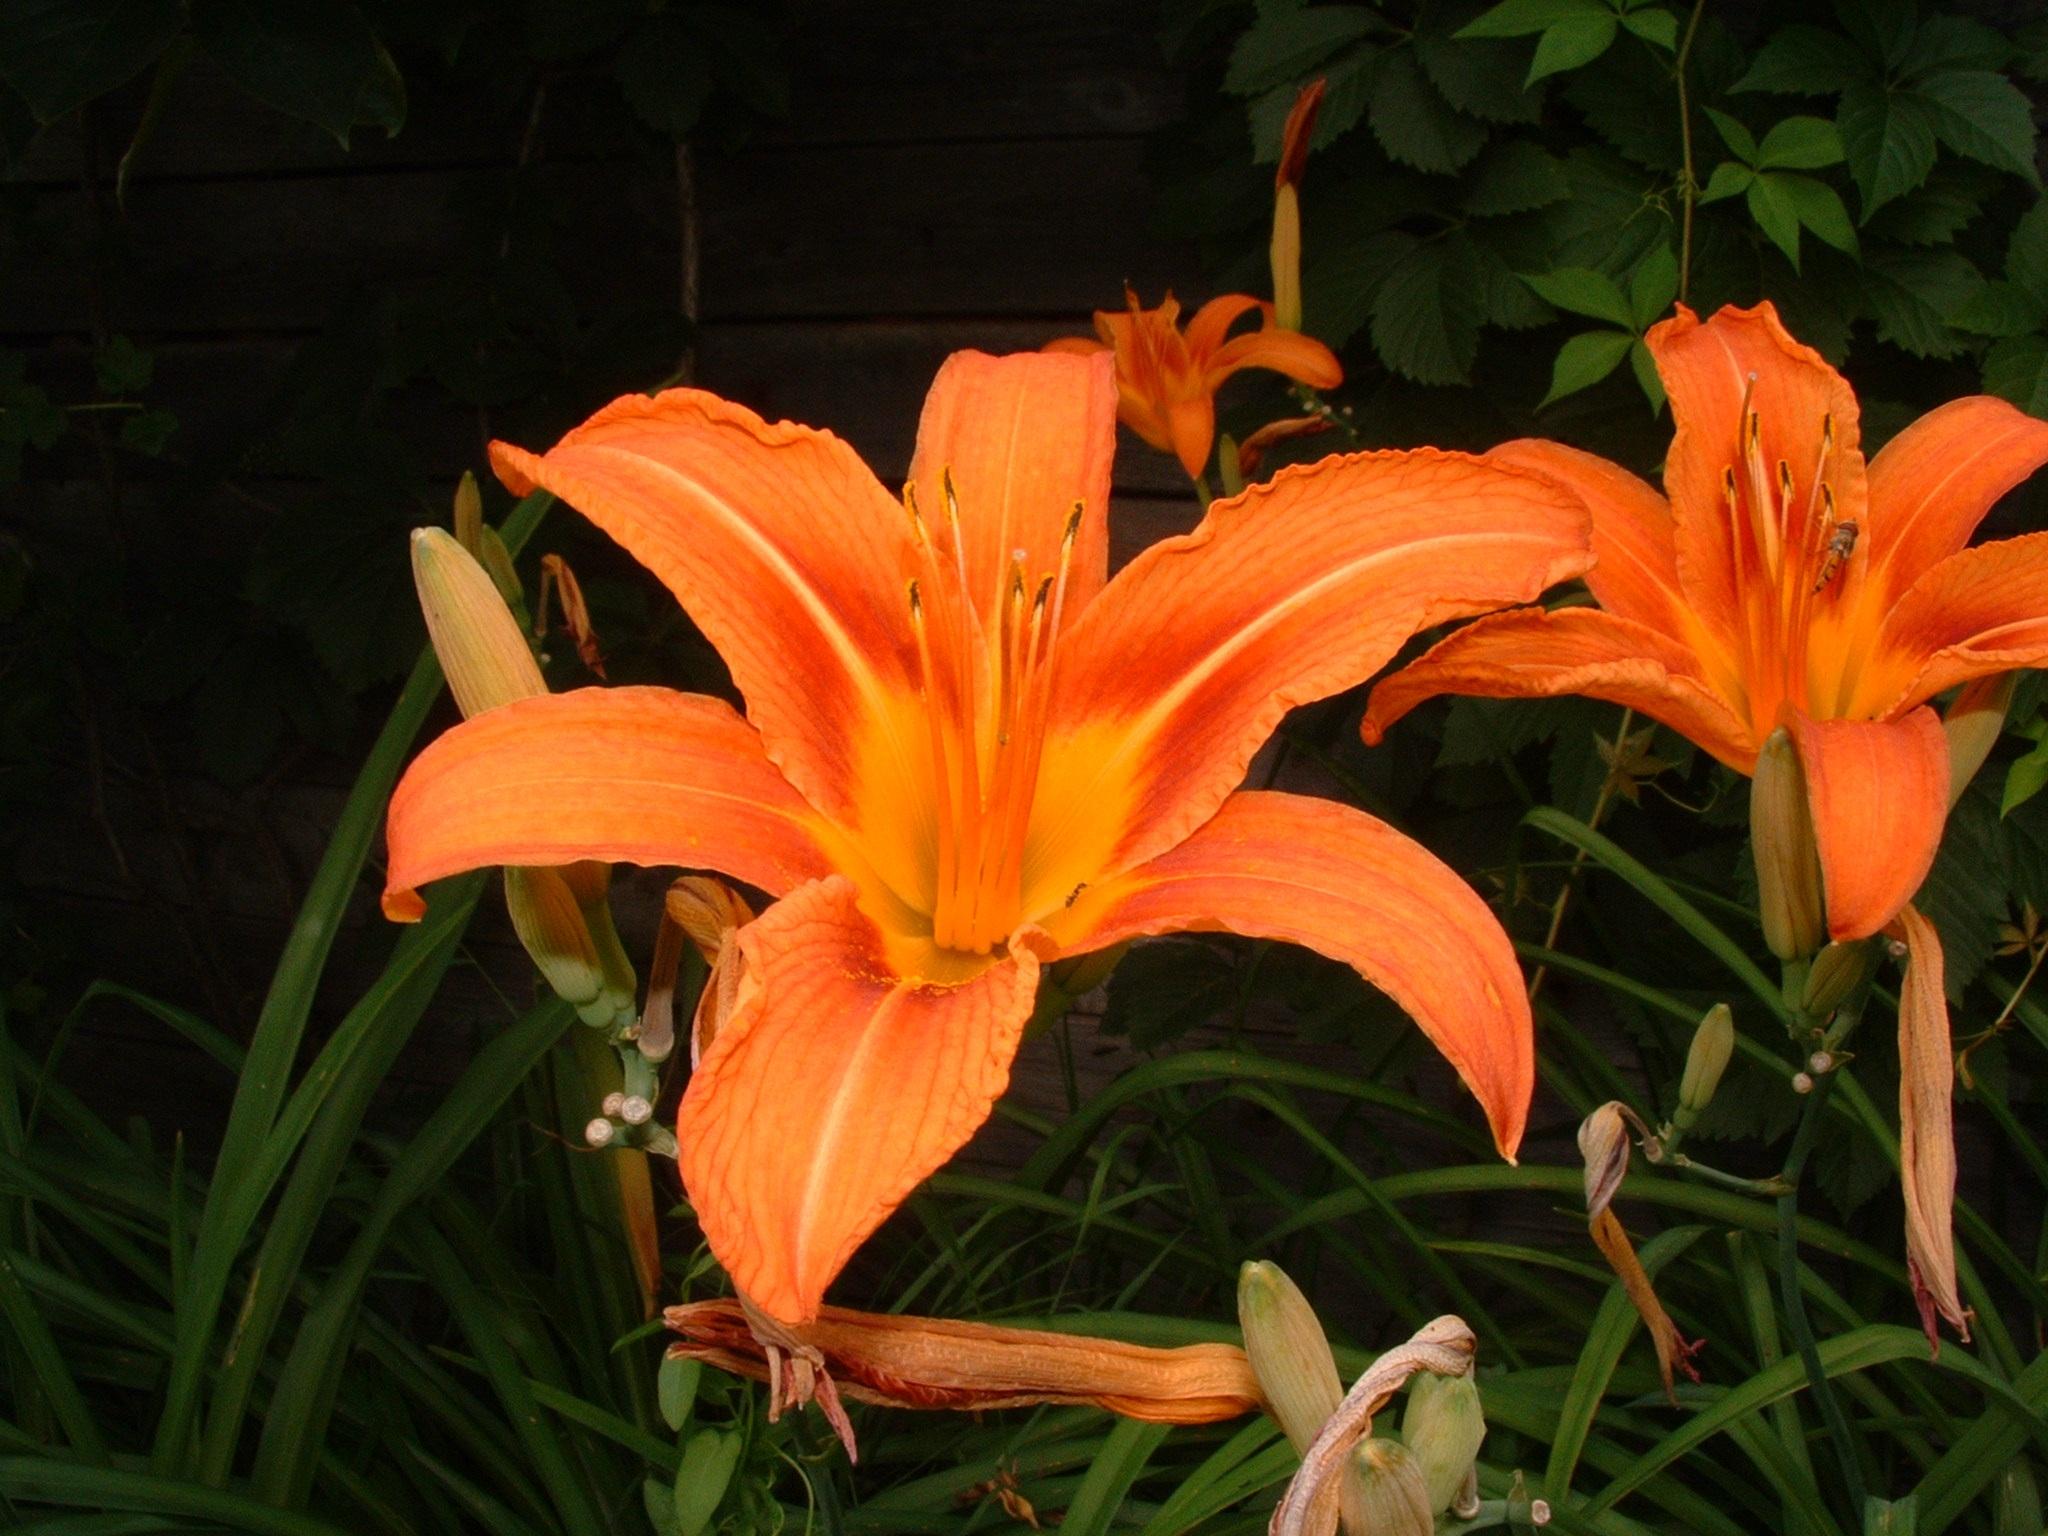 Kostenlose Foto Blume Blutenblatt Bluhen Fruhling Botanik